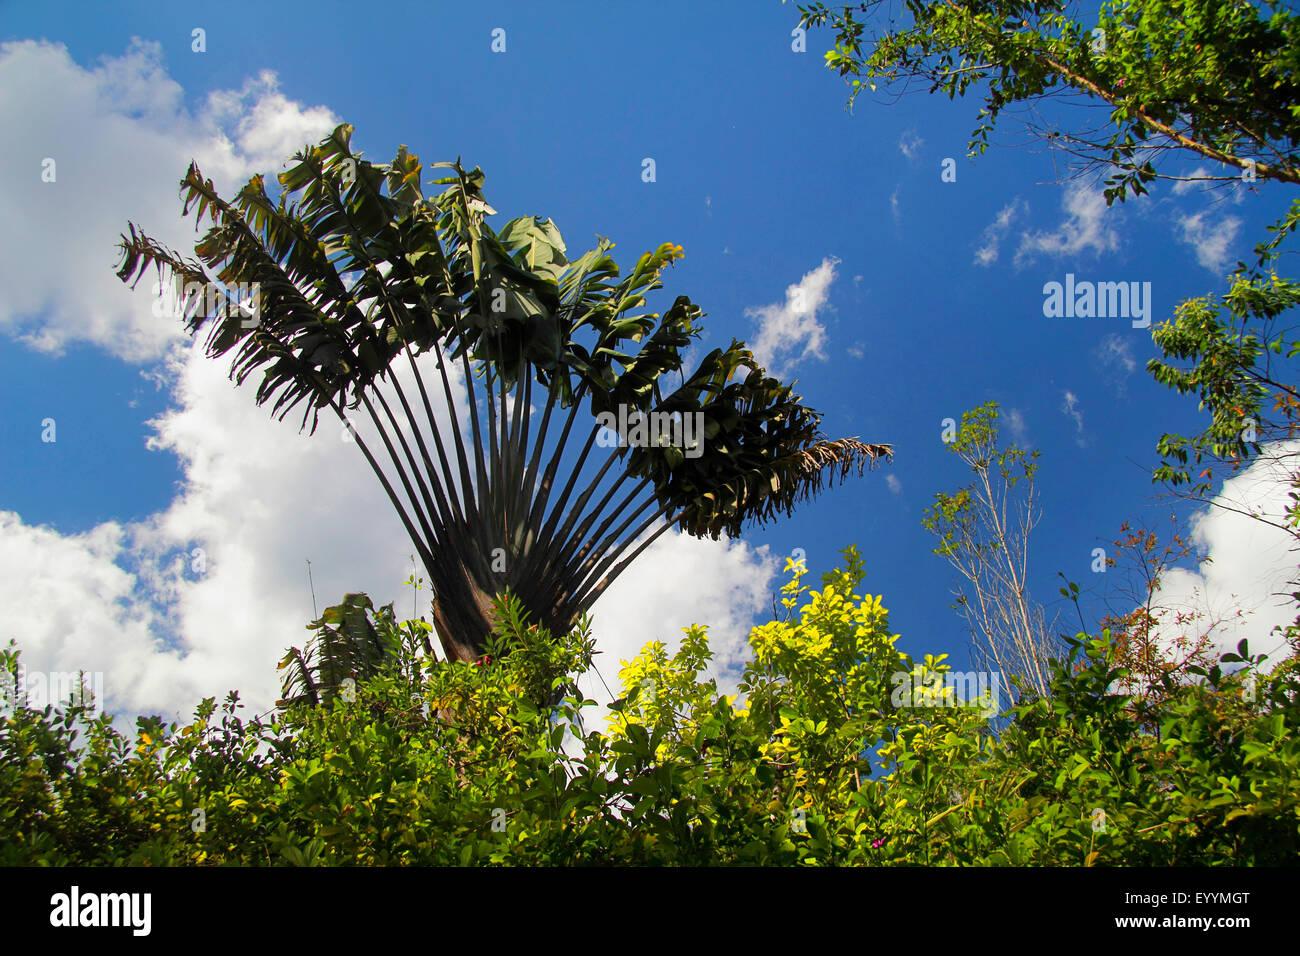 traveller's tree (Ravenala madagascariensis), view to the fan bracing tree crown, Madagascar, Analamazaotra - Stock Image